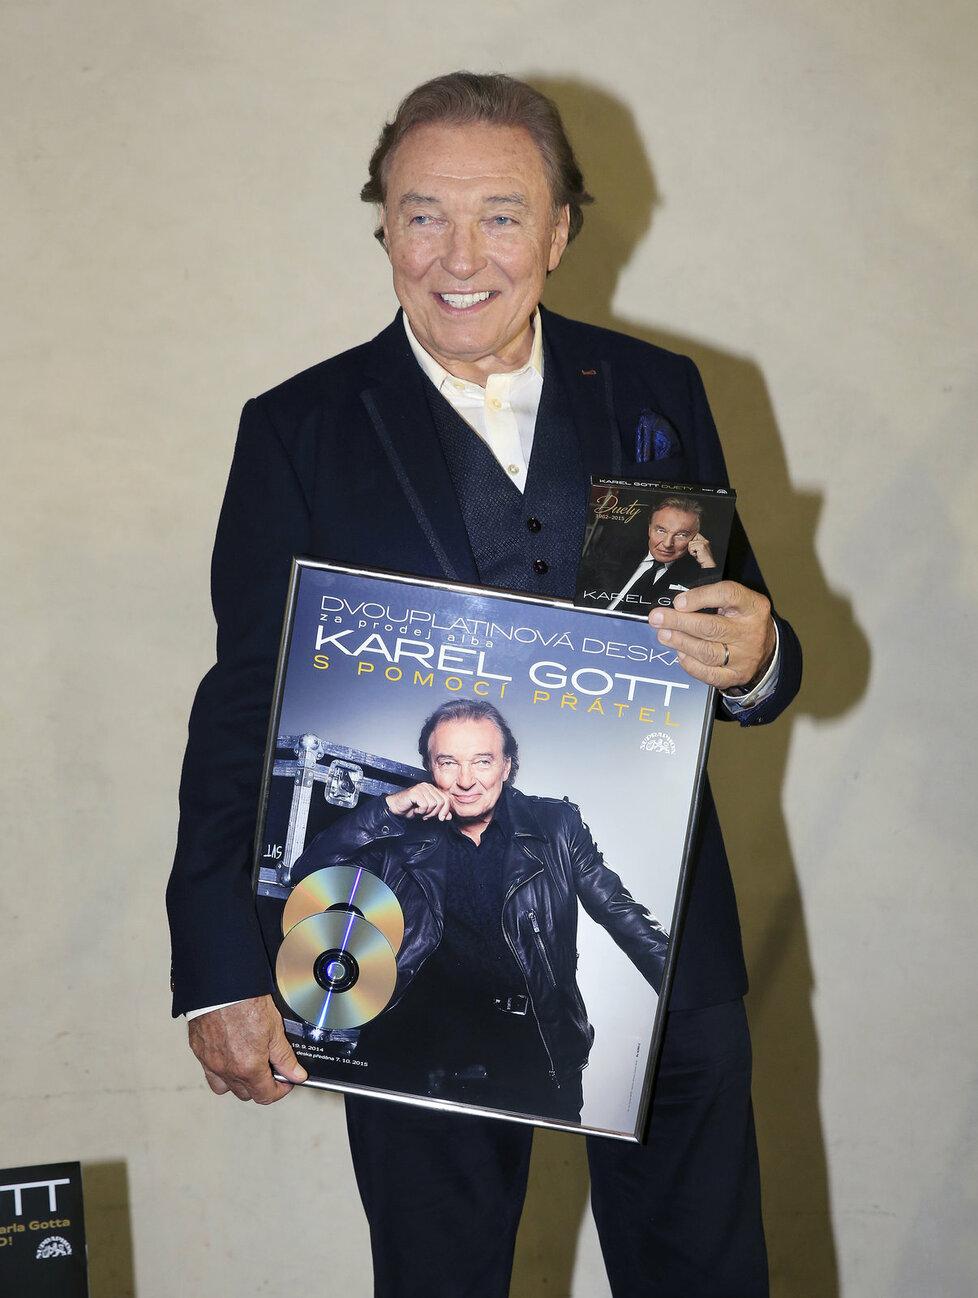 Karel Gott se svou deskou